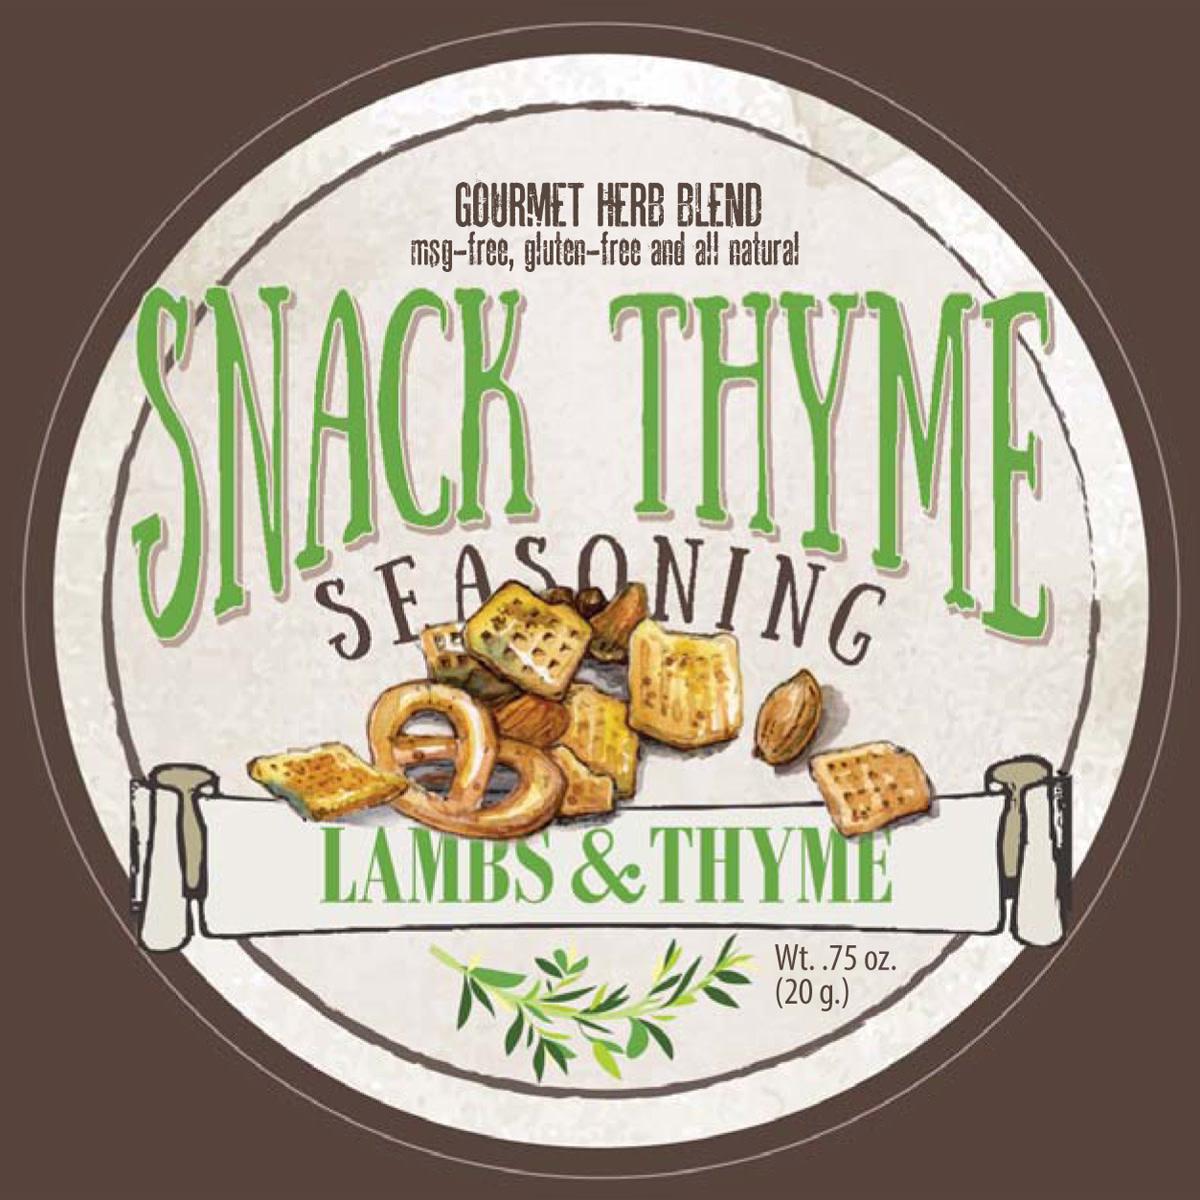 Lambs & Thyme Snack Thyme Seasoning